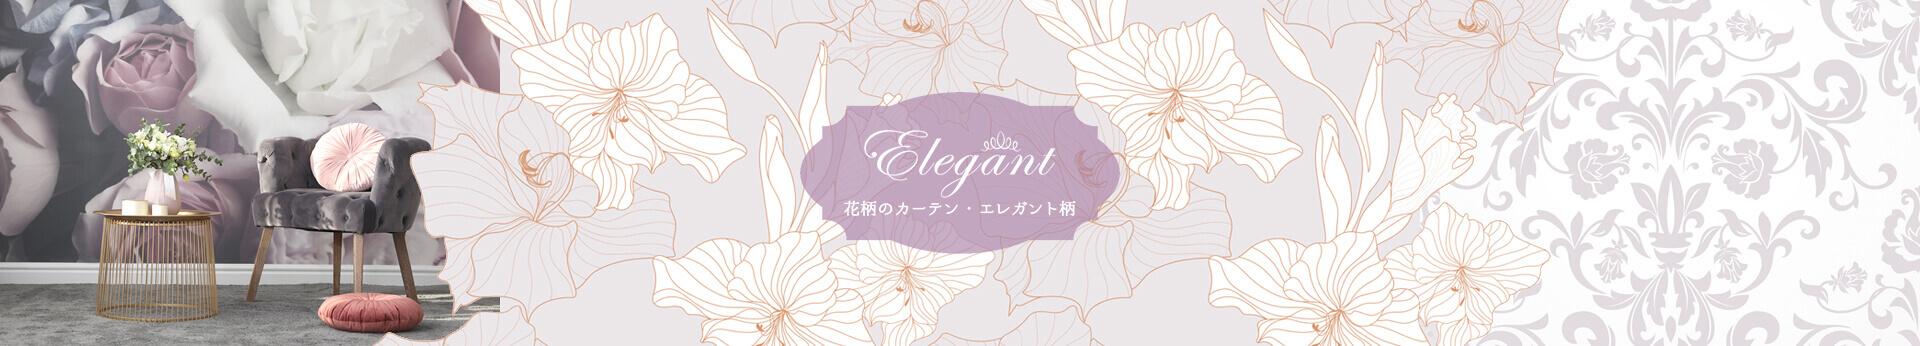 ELEGANT 花柄のカーテン・エレガント柄